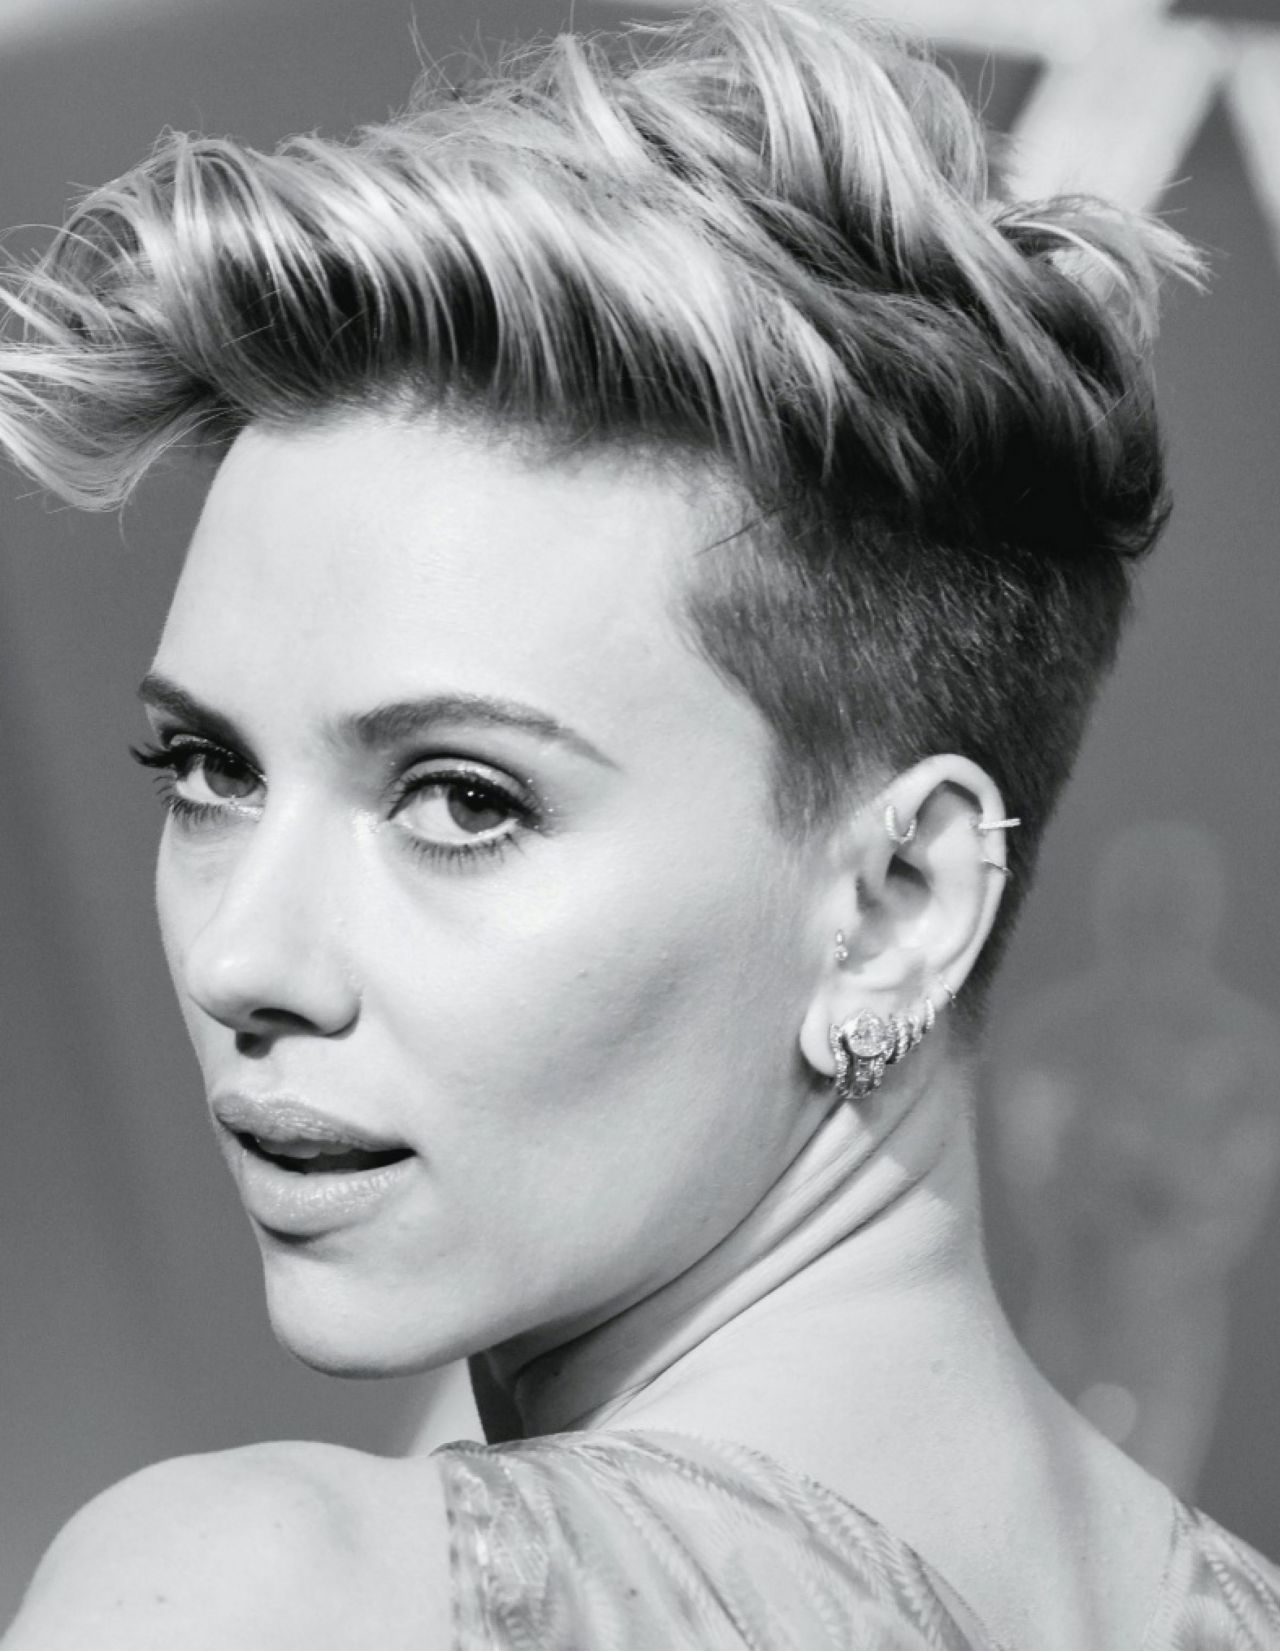 Scarlett Johansson - Tu Style N.13, March 21st, 2017 Scarlett Johansson